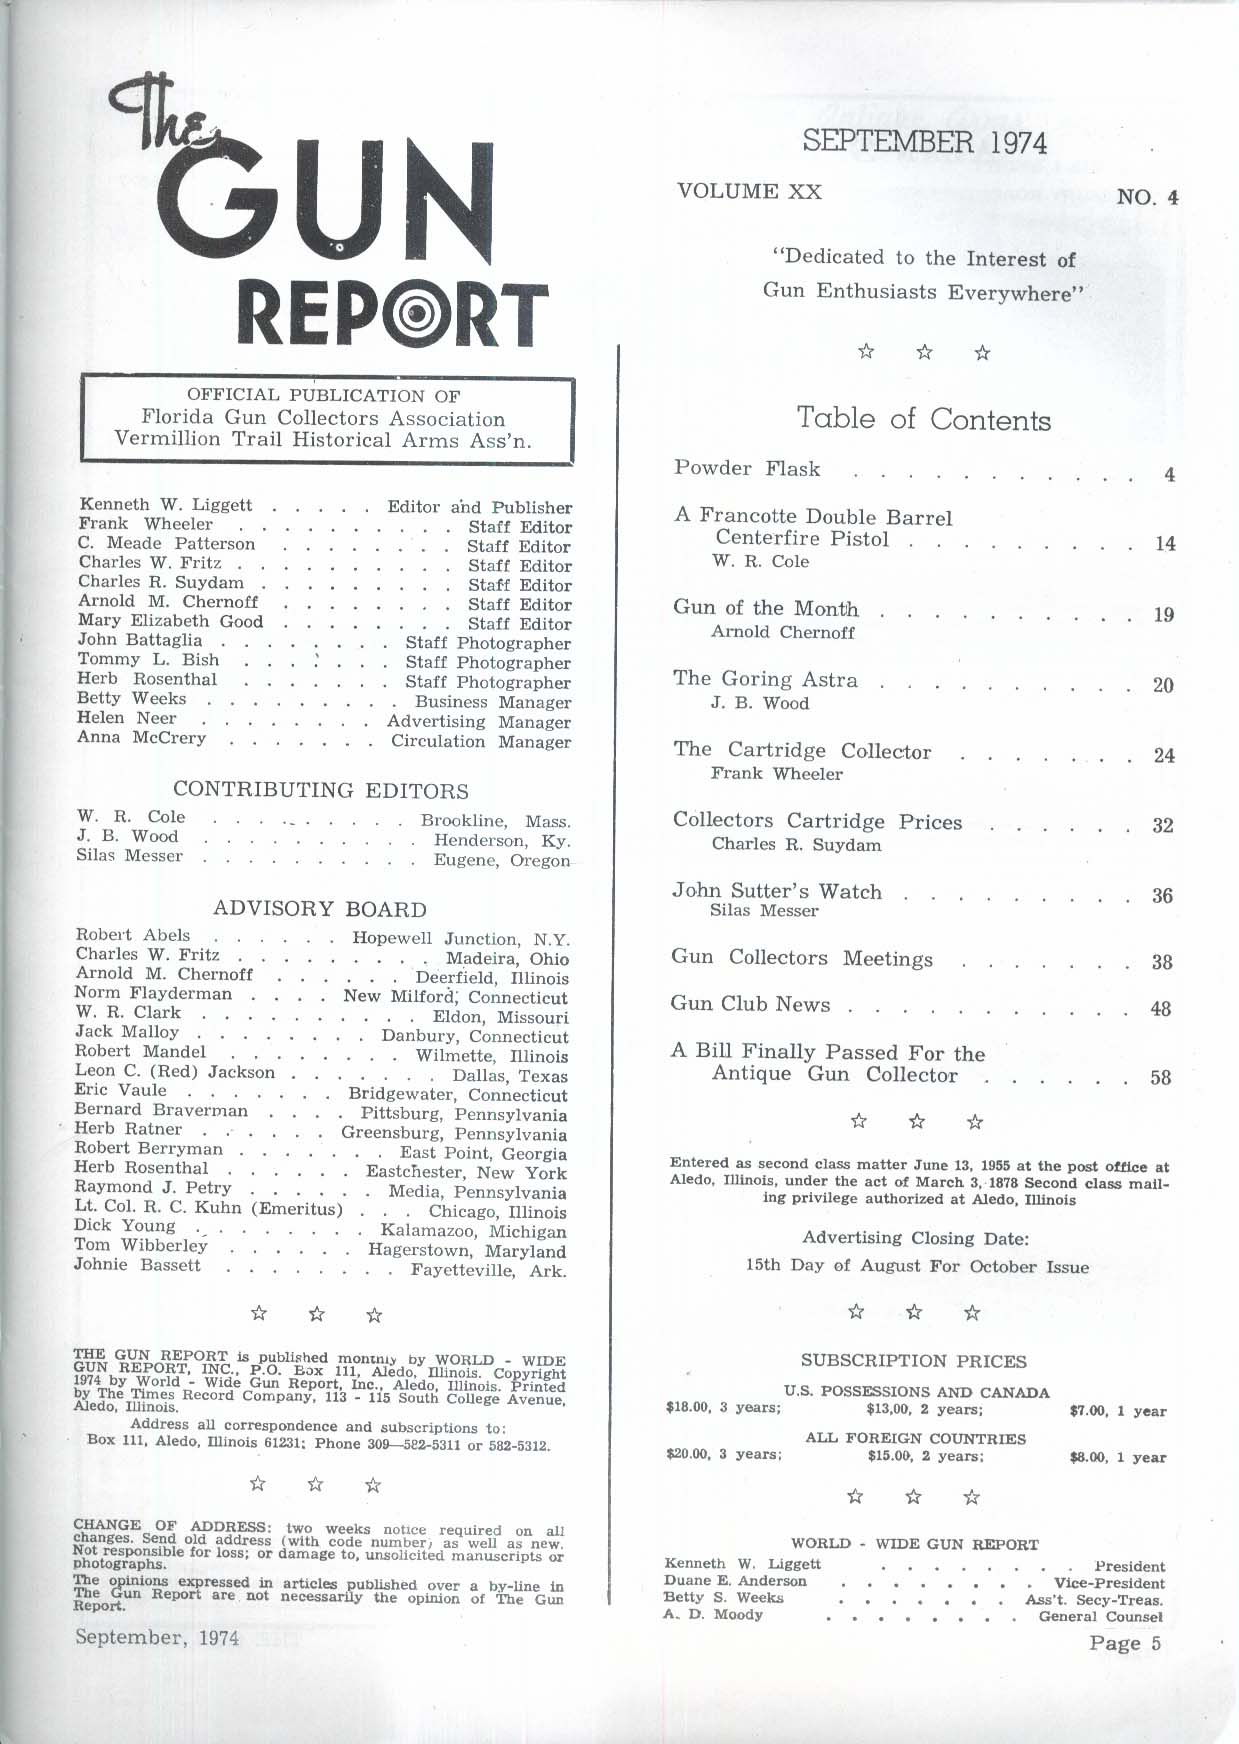 GUN REPORT Grancotte Double Barrel Pistol Goring Astra 9 1974